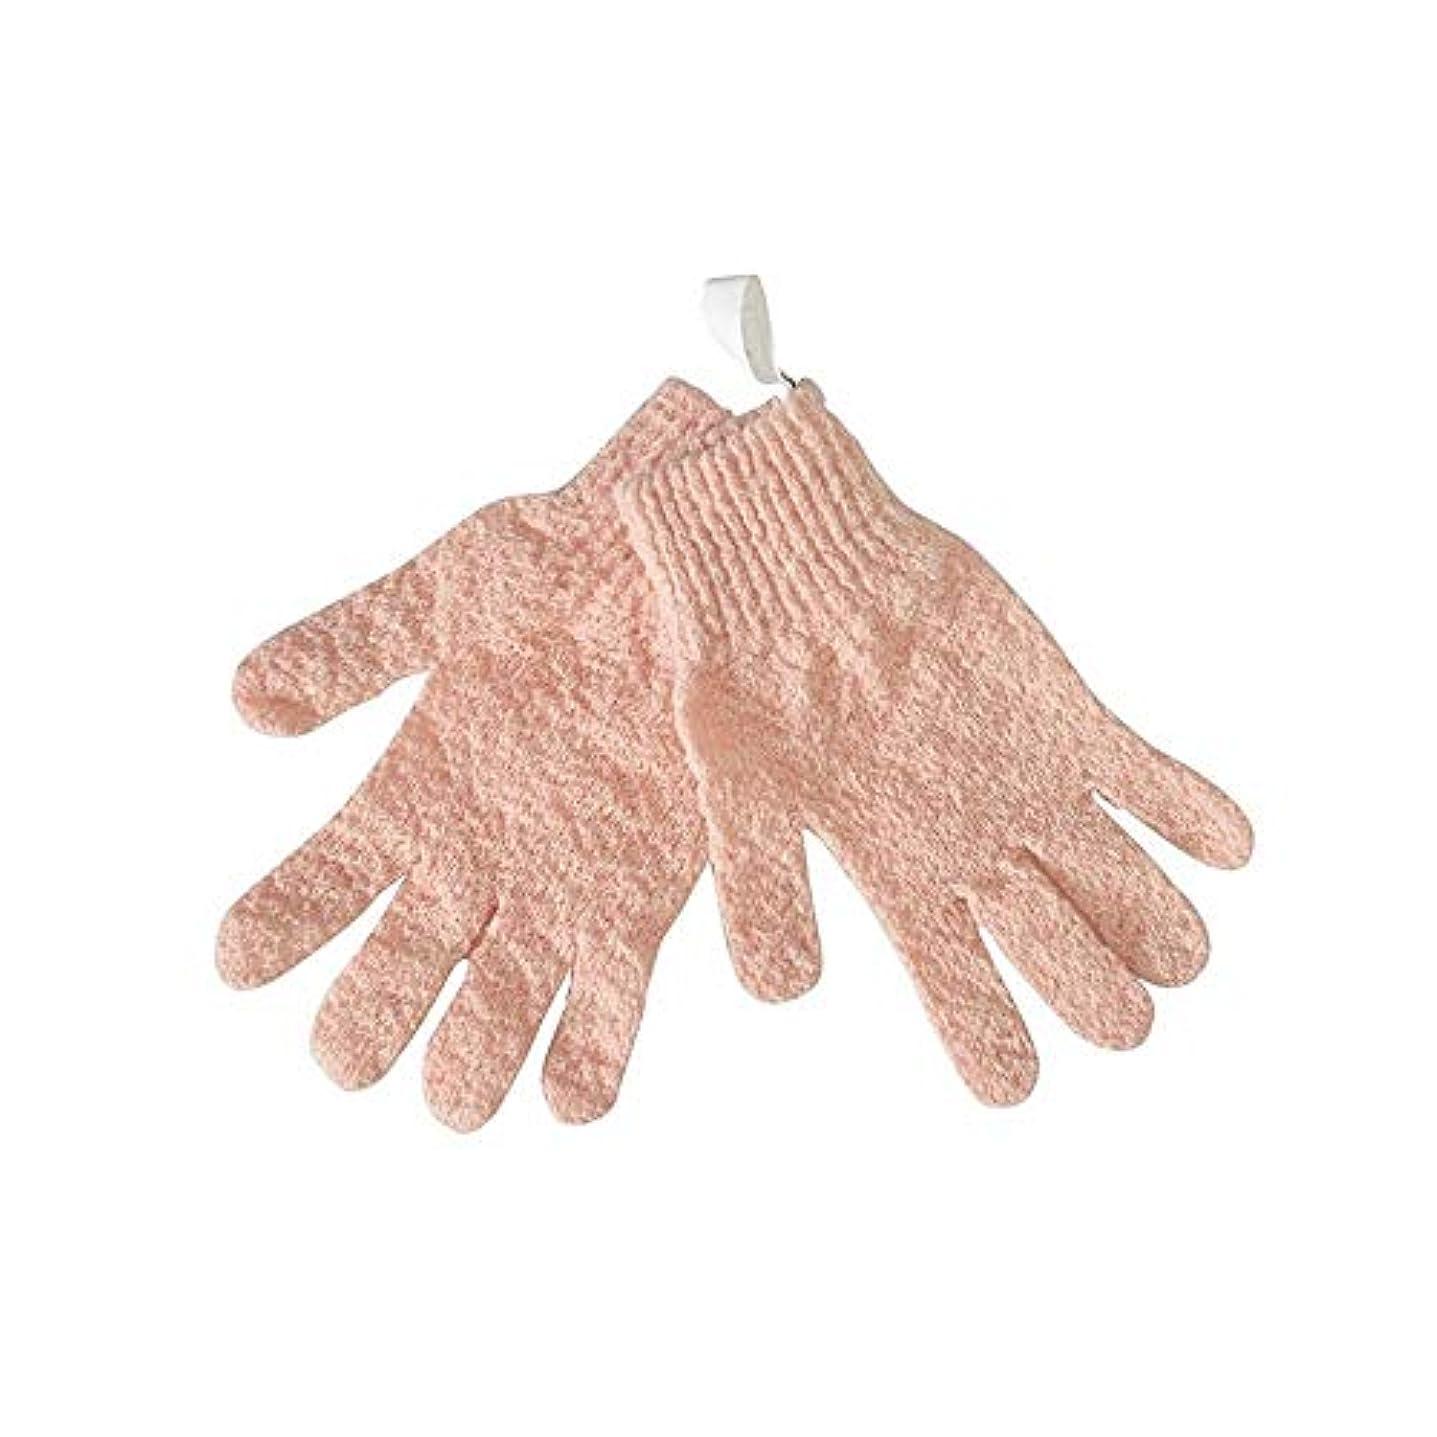 BTXXYJP シャワー手袋 お風呂用手袋 あかすり手袋 ボディブラシ ボディタオル やわらか バス用品 男女兼用 角質除去 (Color : Pink)